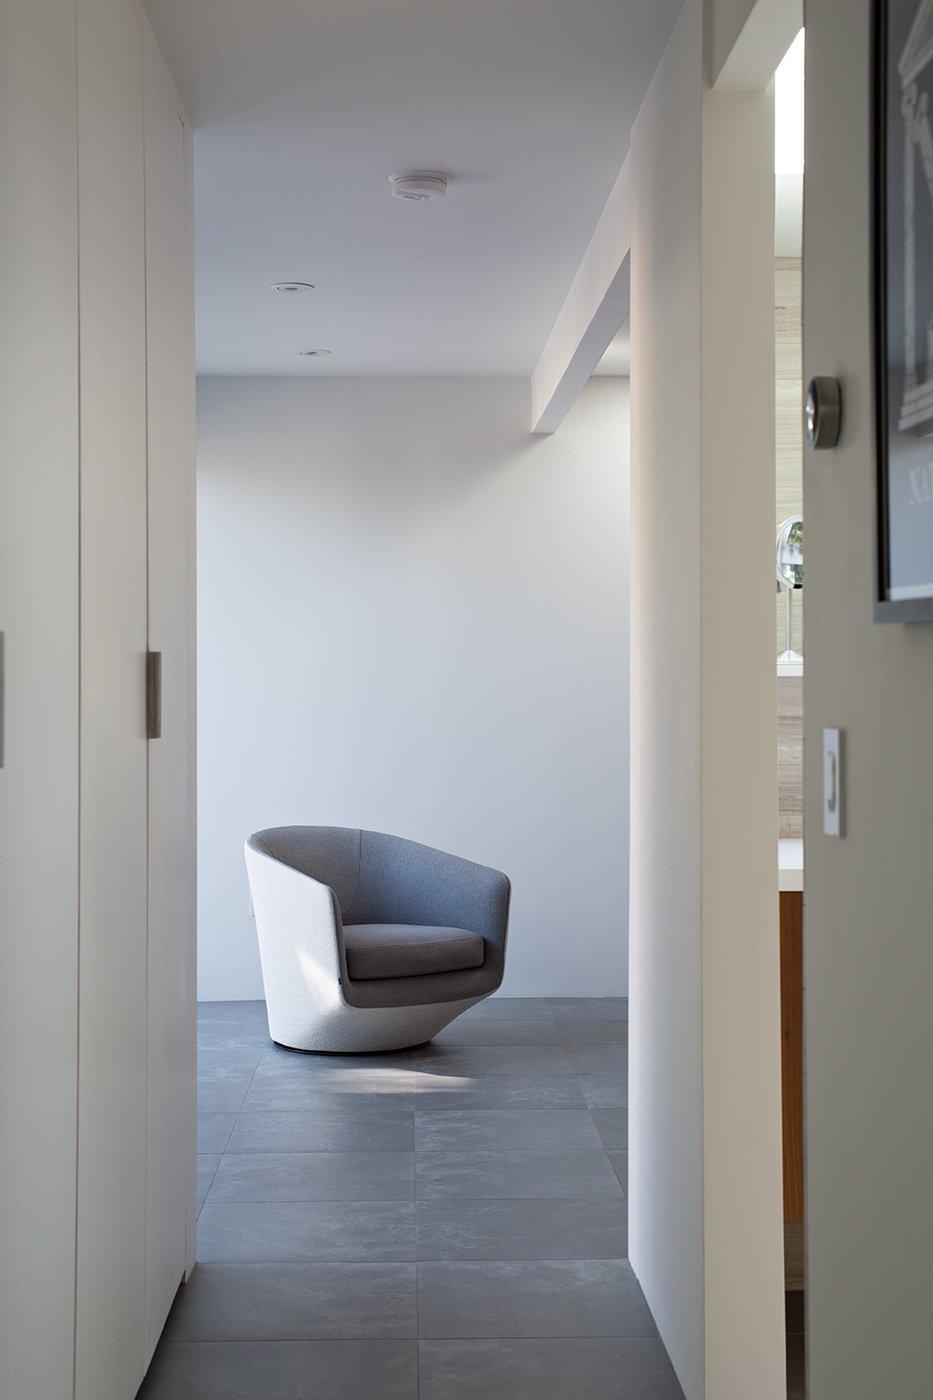 #seatingdesign #seating #NextraPiombo #tiles #Monocibec #U-Turn #chair #modern #minimalist #NielsBendtsen #crisp #interior #inside #indoor   Photo by Mariko Reed  100+ Best Modern Seating Designs